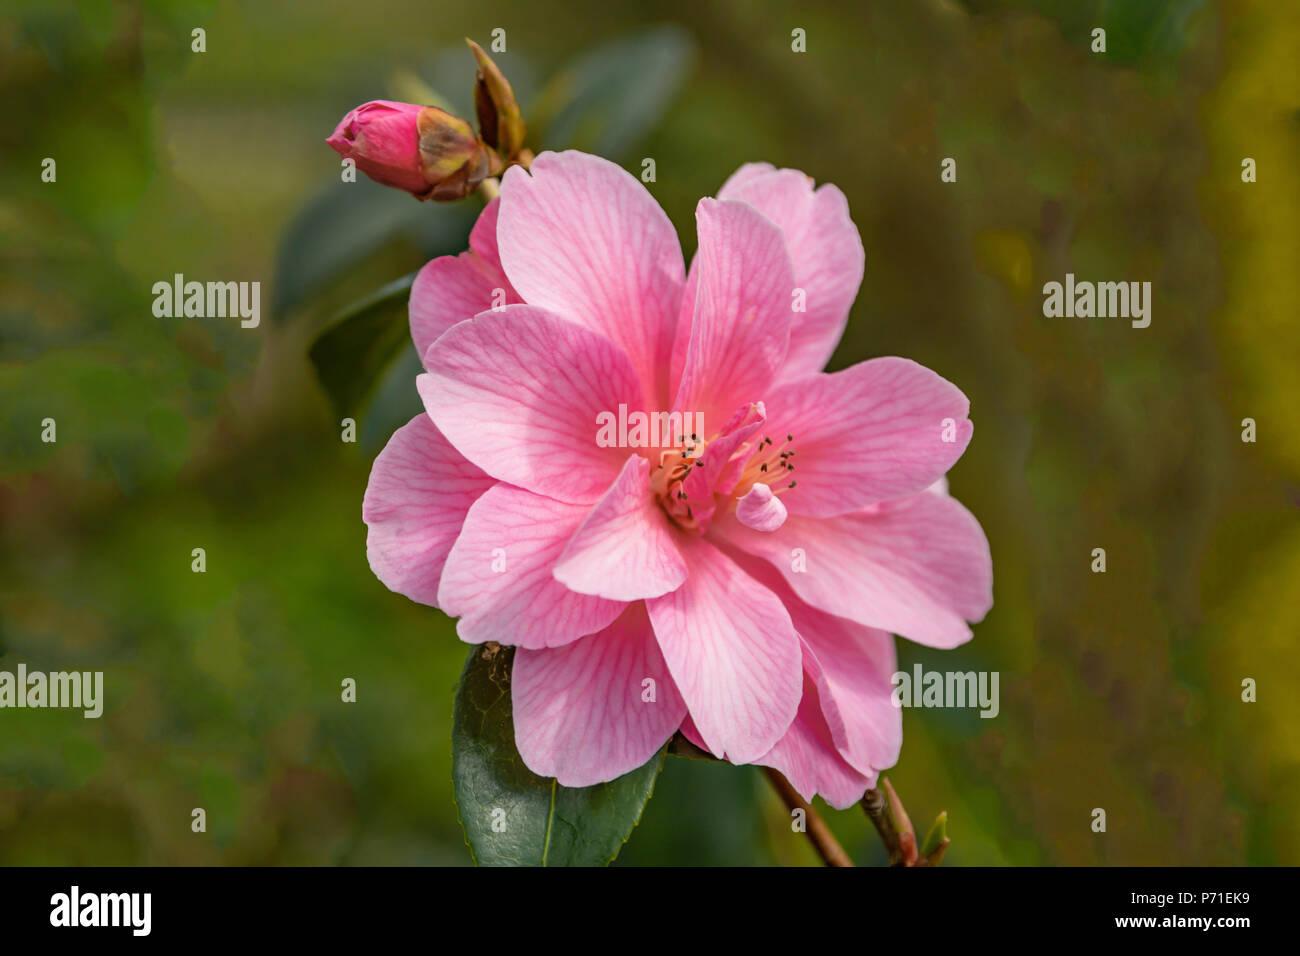 Flowering pink Camellia in Bodnant Garden, near Tal-y-Cafn, Conwy, Wales, United Kingdom, - Stock Image